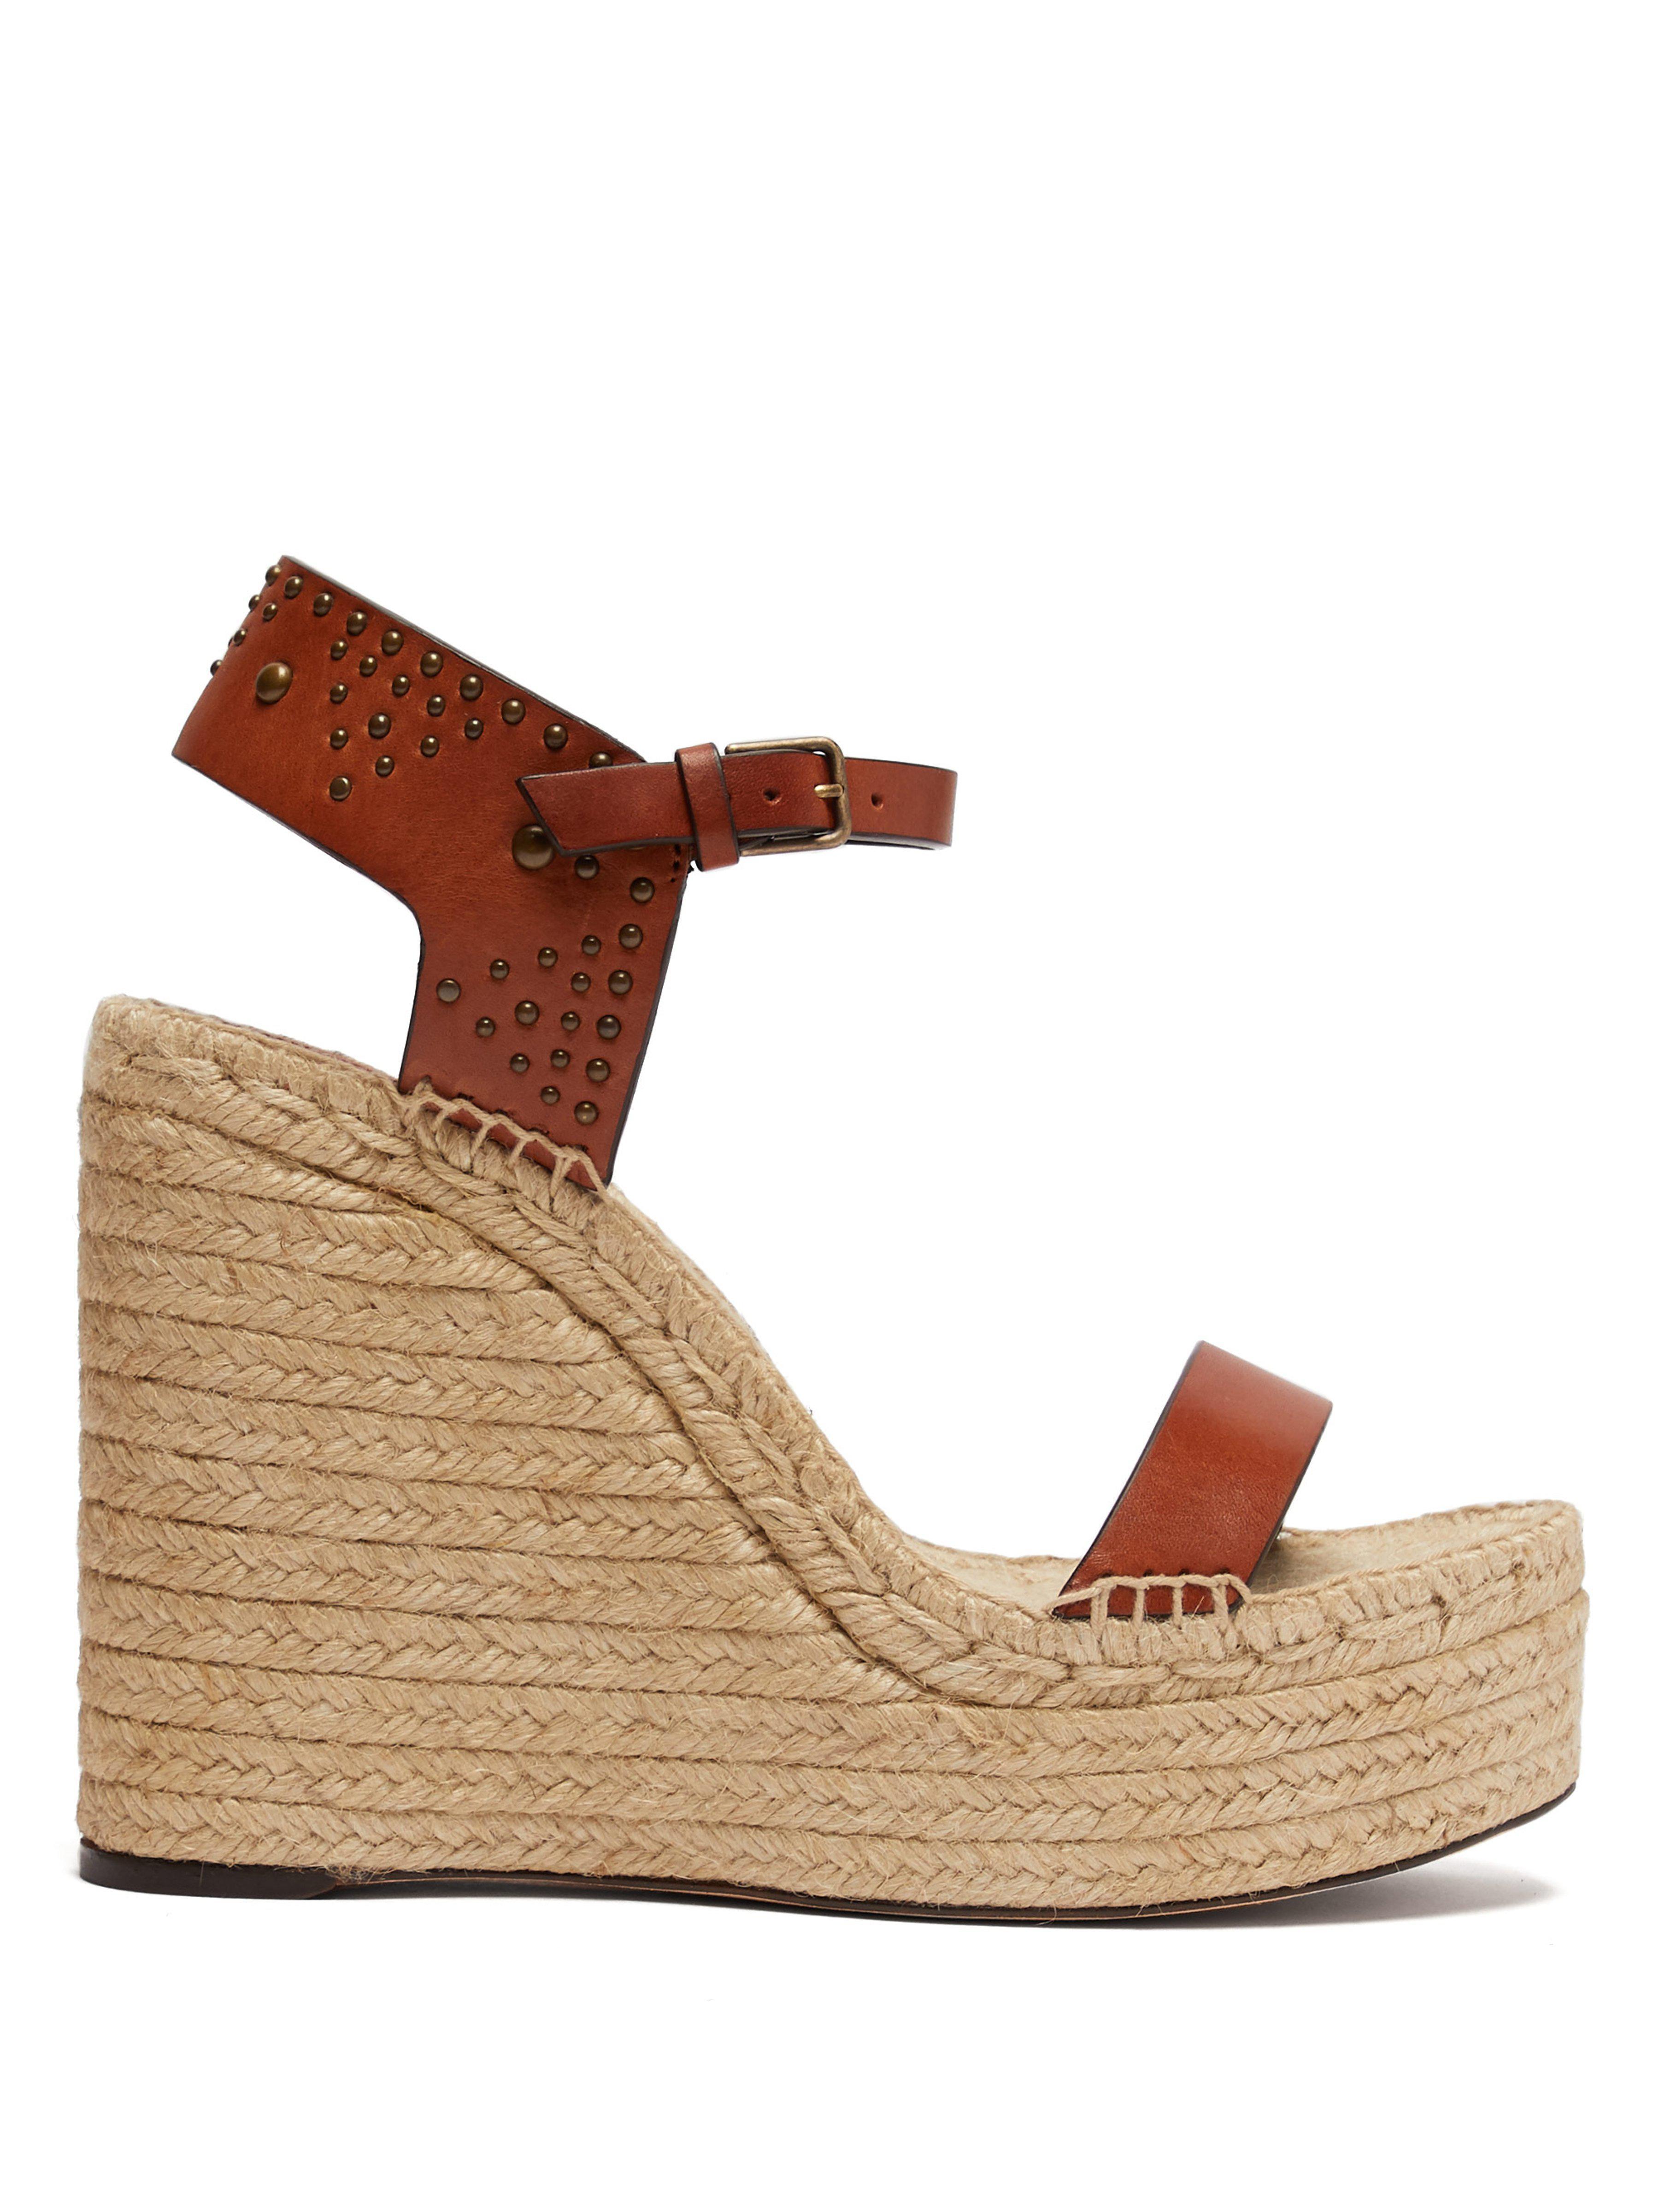 ad1f88f1932 Saint Laurent. Women s Brown Leather Platform Wedge Espadrille Sandal